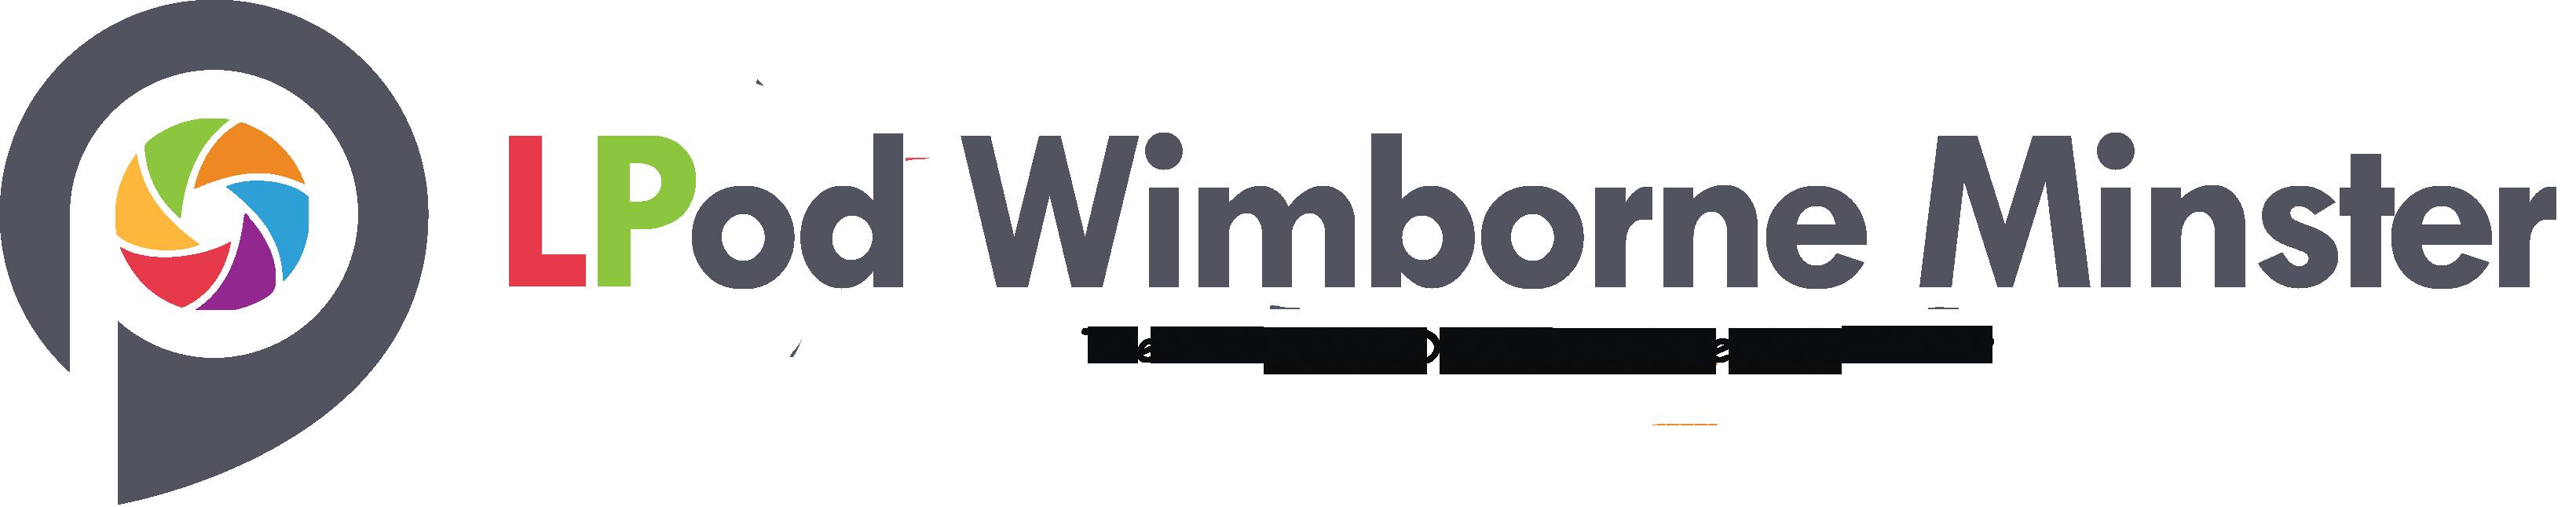 intensive driving courses wimborne minster, intensive driving lessons wimborne minster, intensive driving school wimborne minster